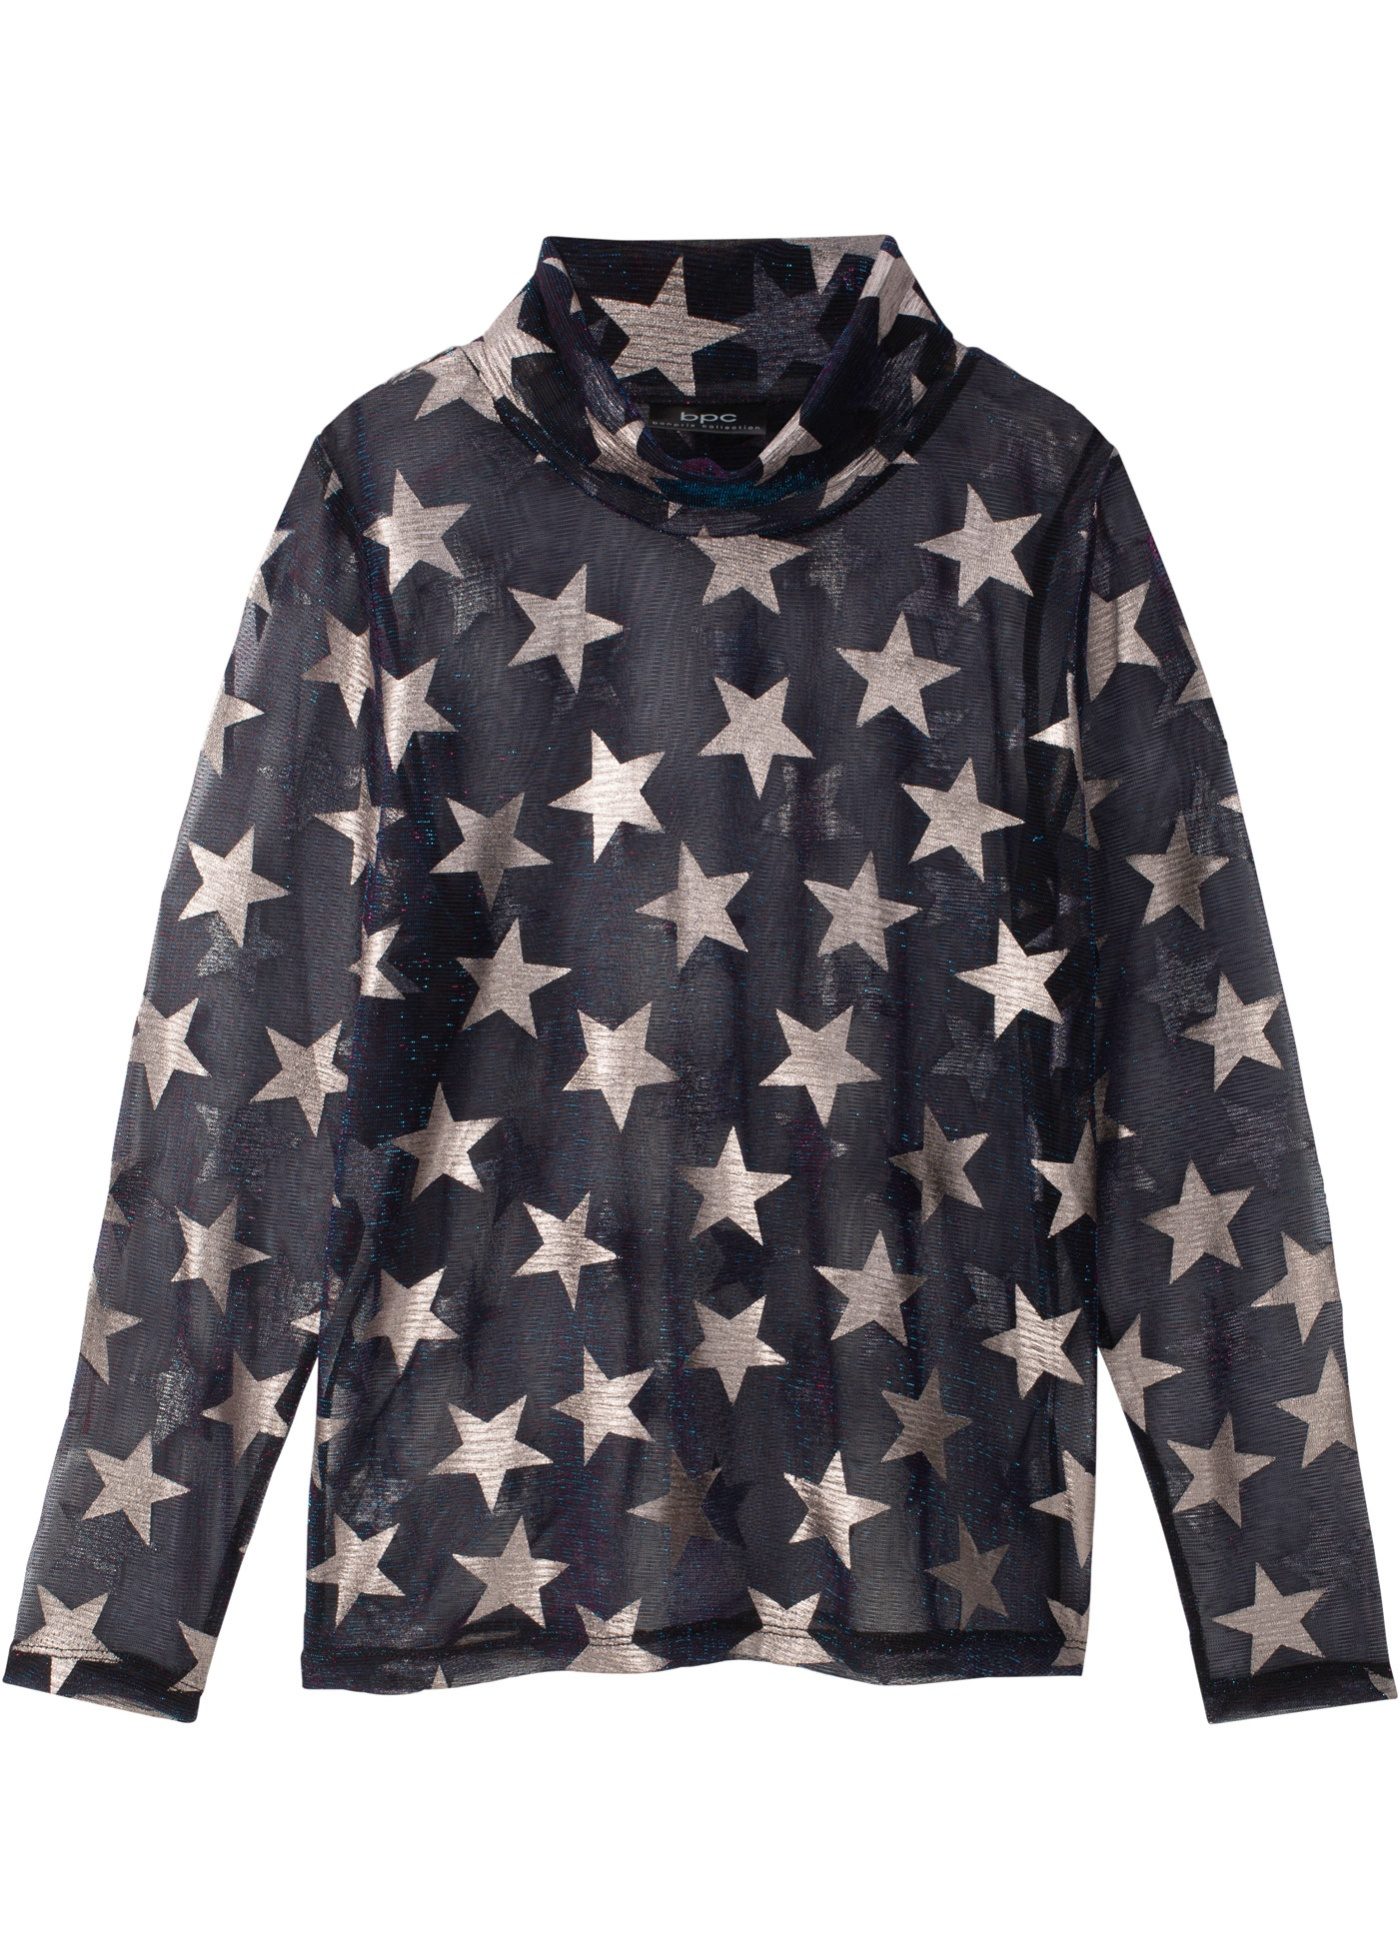 Mädchen,  Kinder bonprix Transparente Bluse mit Sternendruck blau   06940487602929